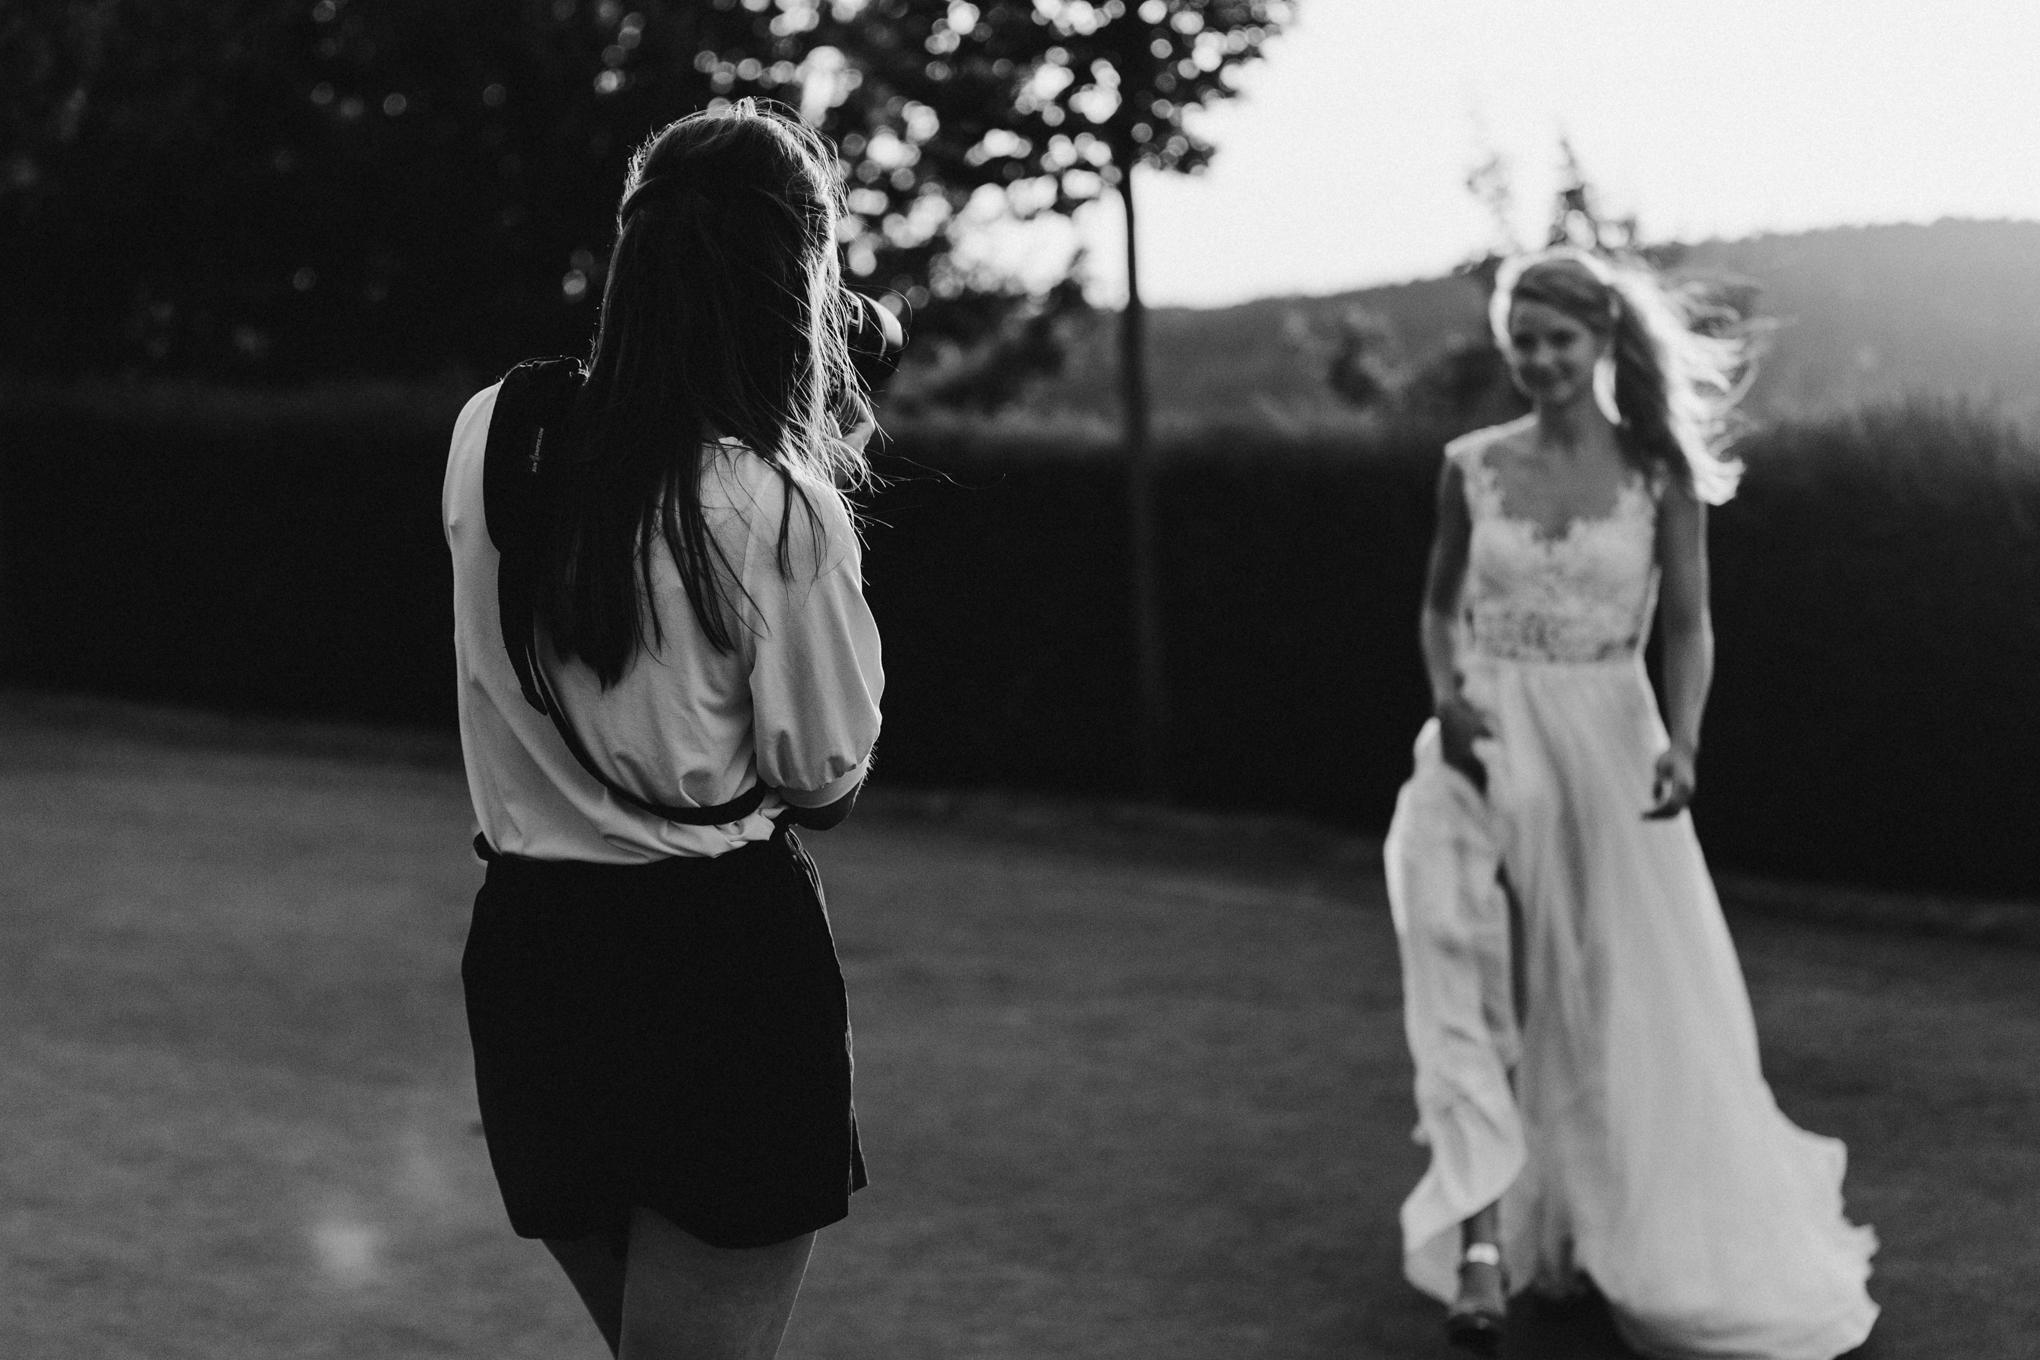 Hochzeitsfotografin aus Köln fotografiert Braut